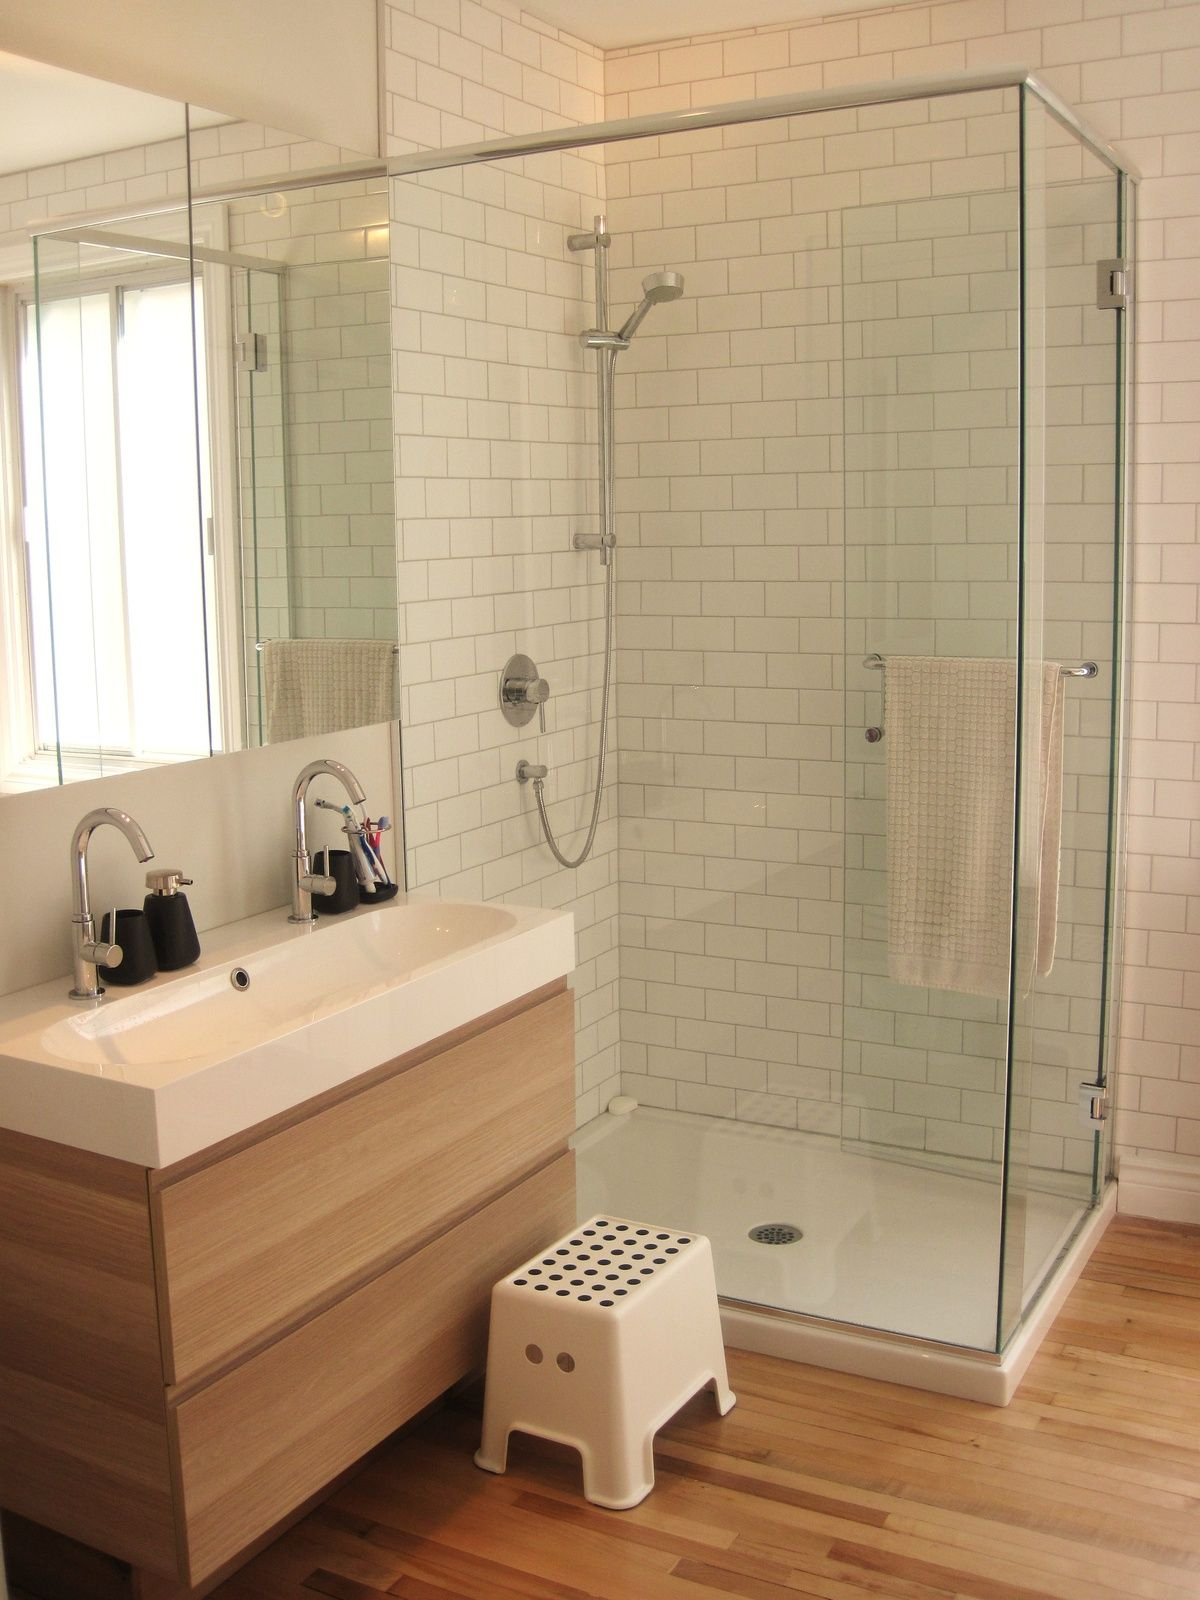 Pin De Kaka Chen En Interior_Bathroom | Cuartos De Baños dedans Ikeasalle De Bain